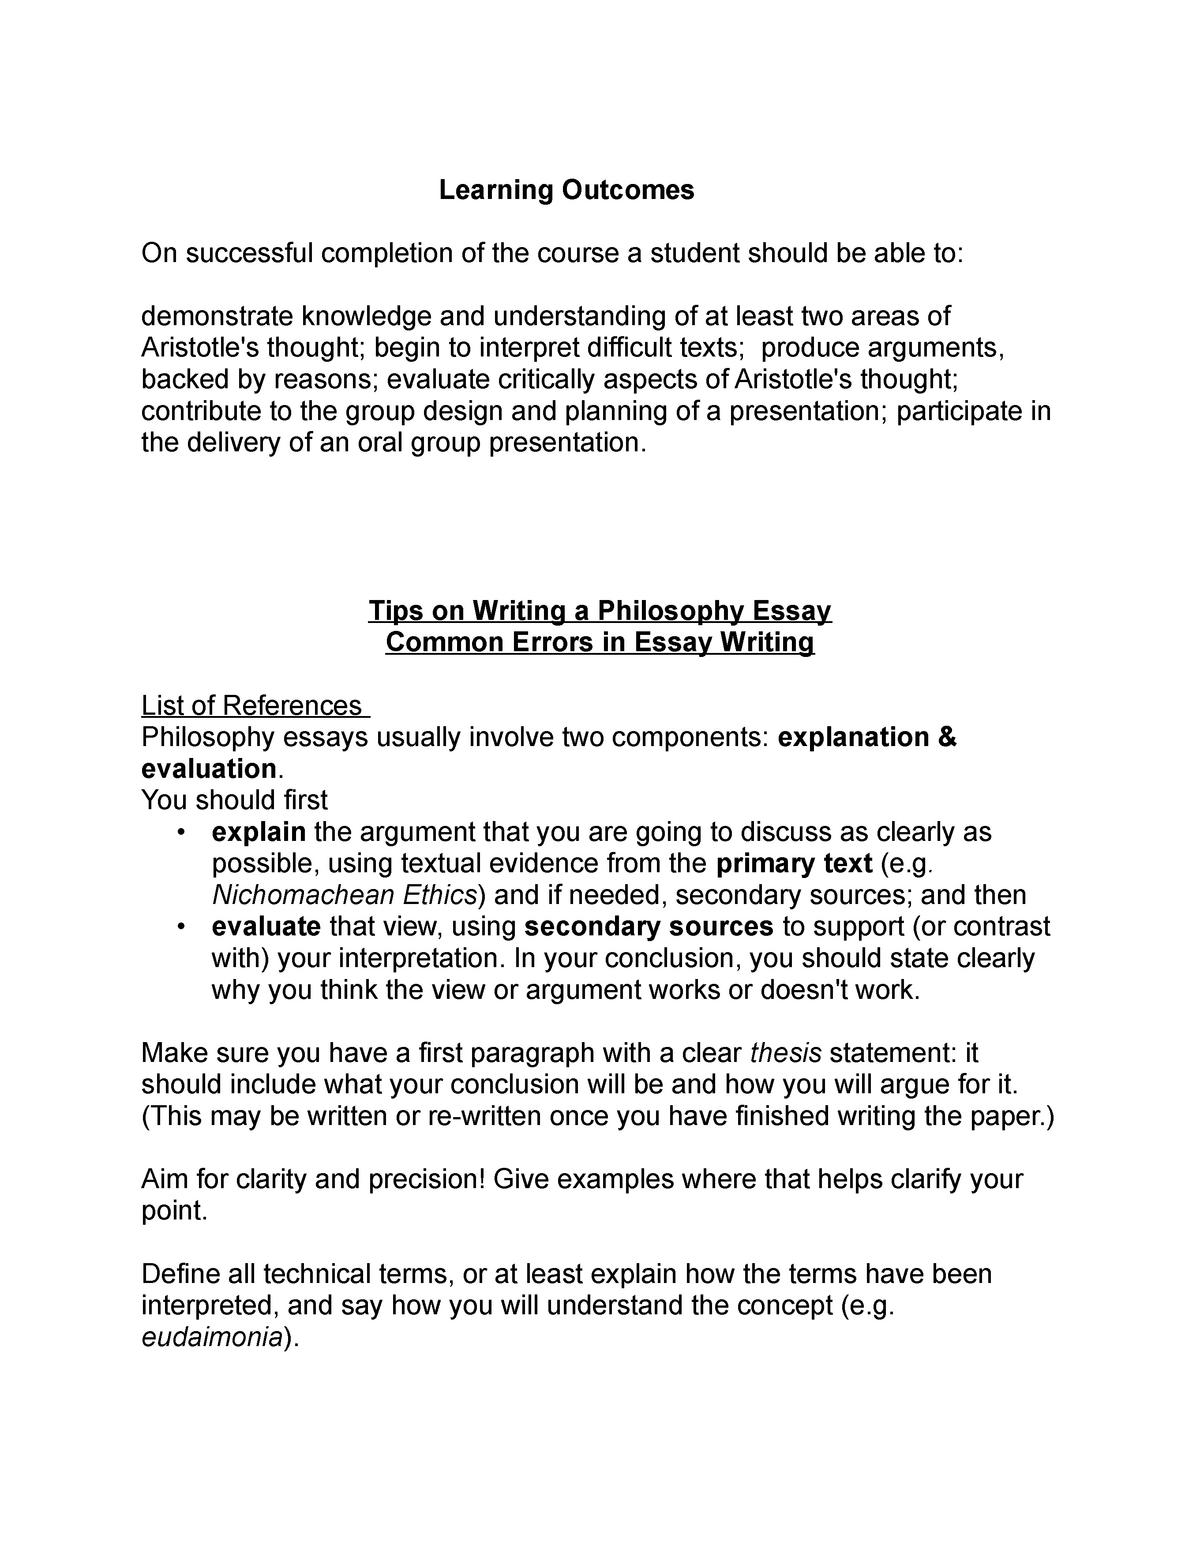 philosophy essay writing tips   hum aristotle   studocu